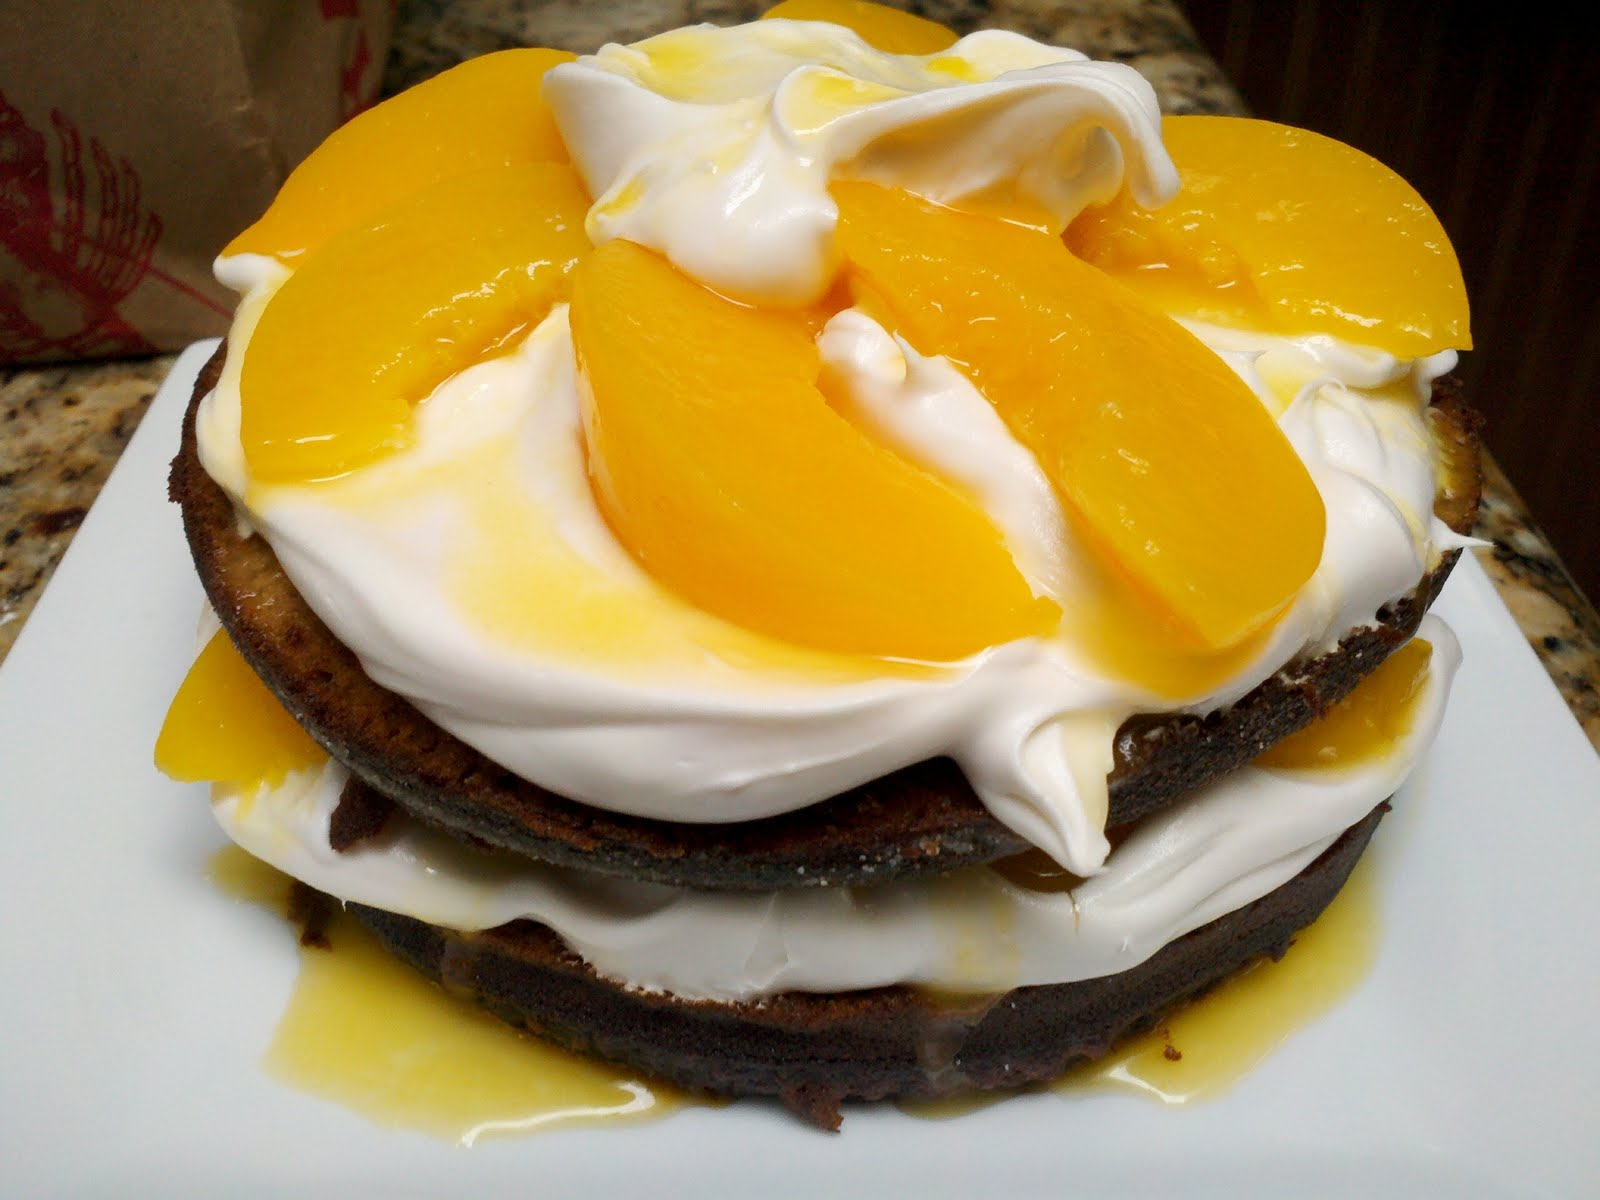 Delicious Low Sugar Cake Recipes: Globally Gluten Free!: Easy Delicious GF, Non Dairy, Low